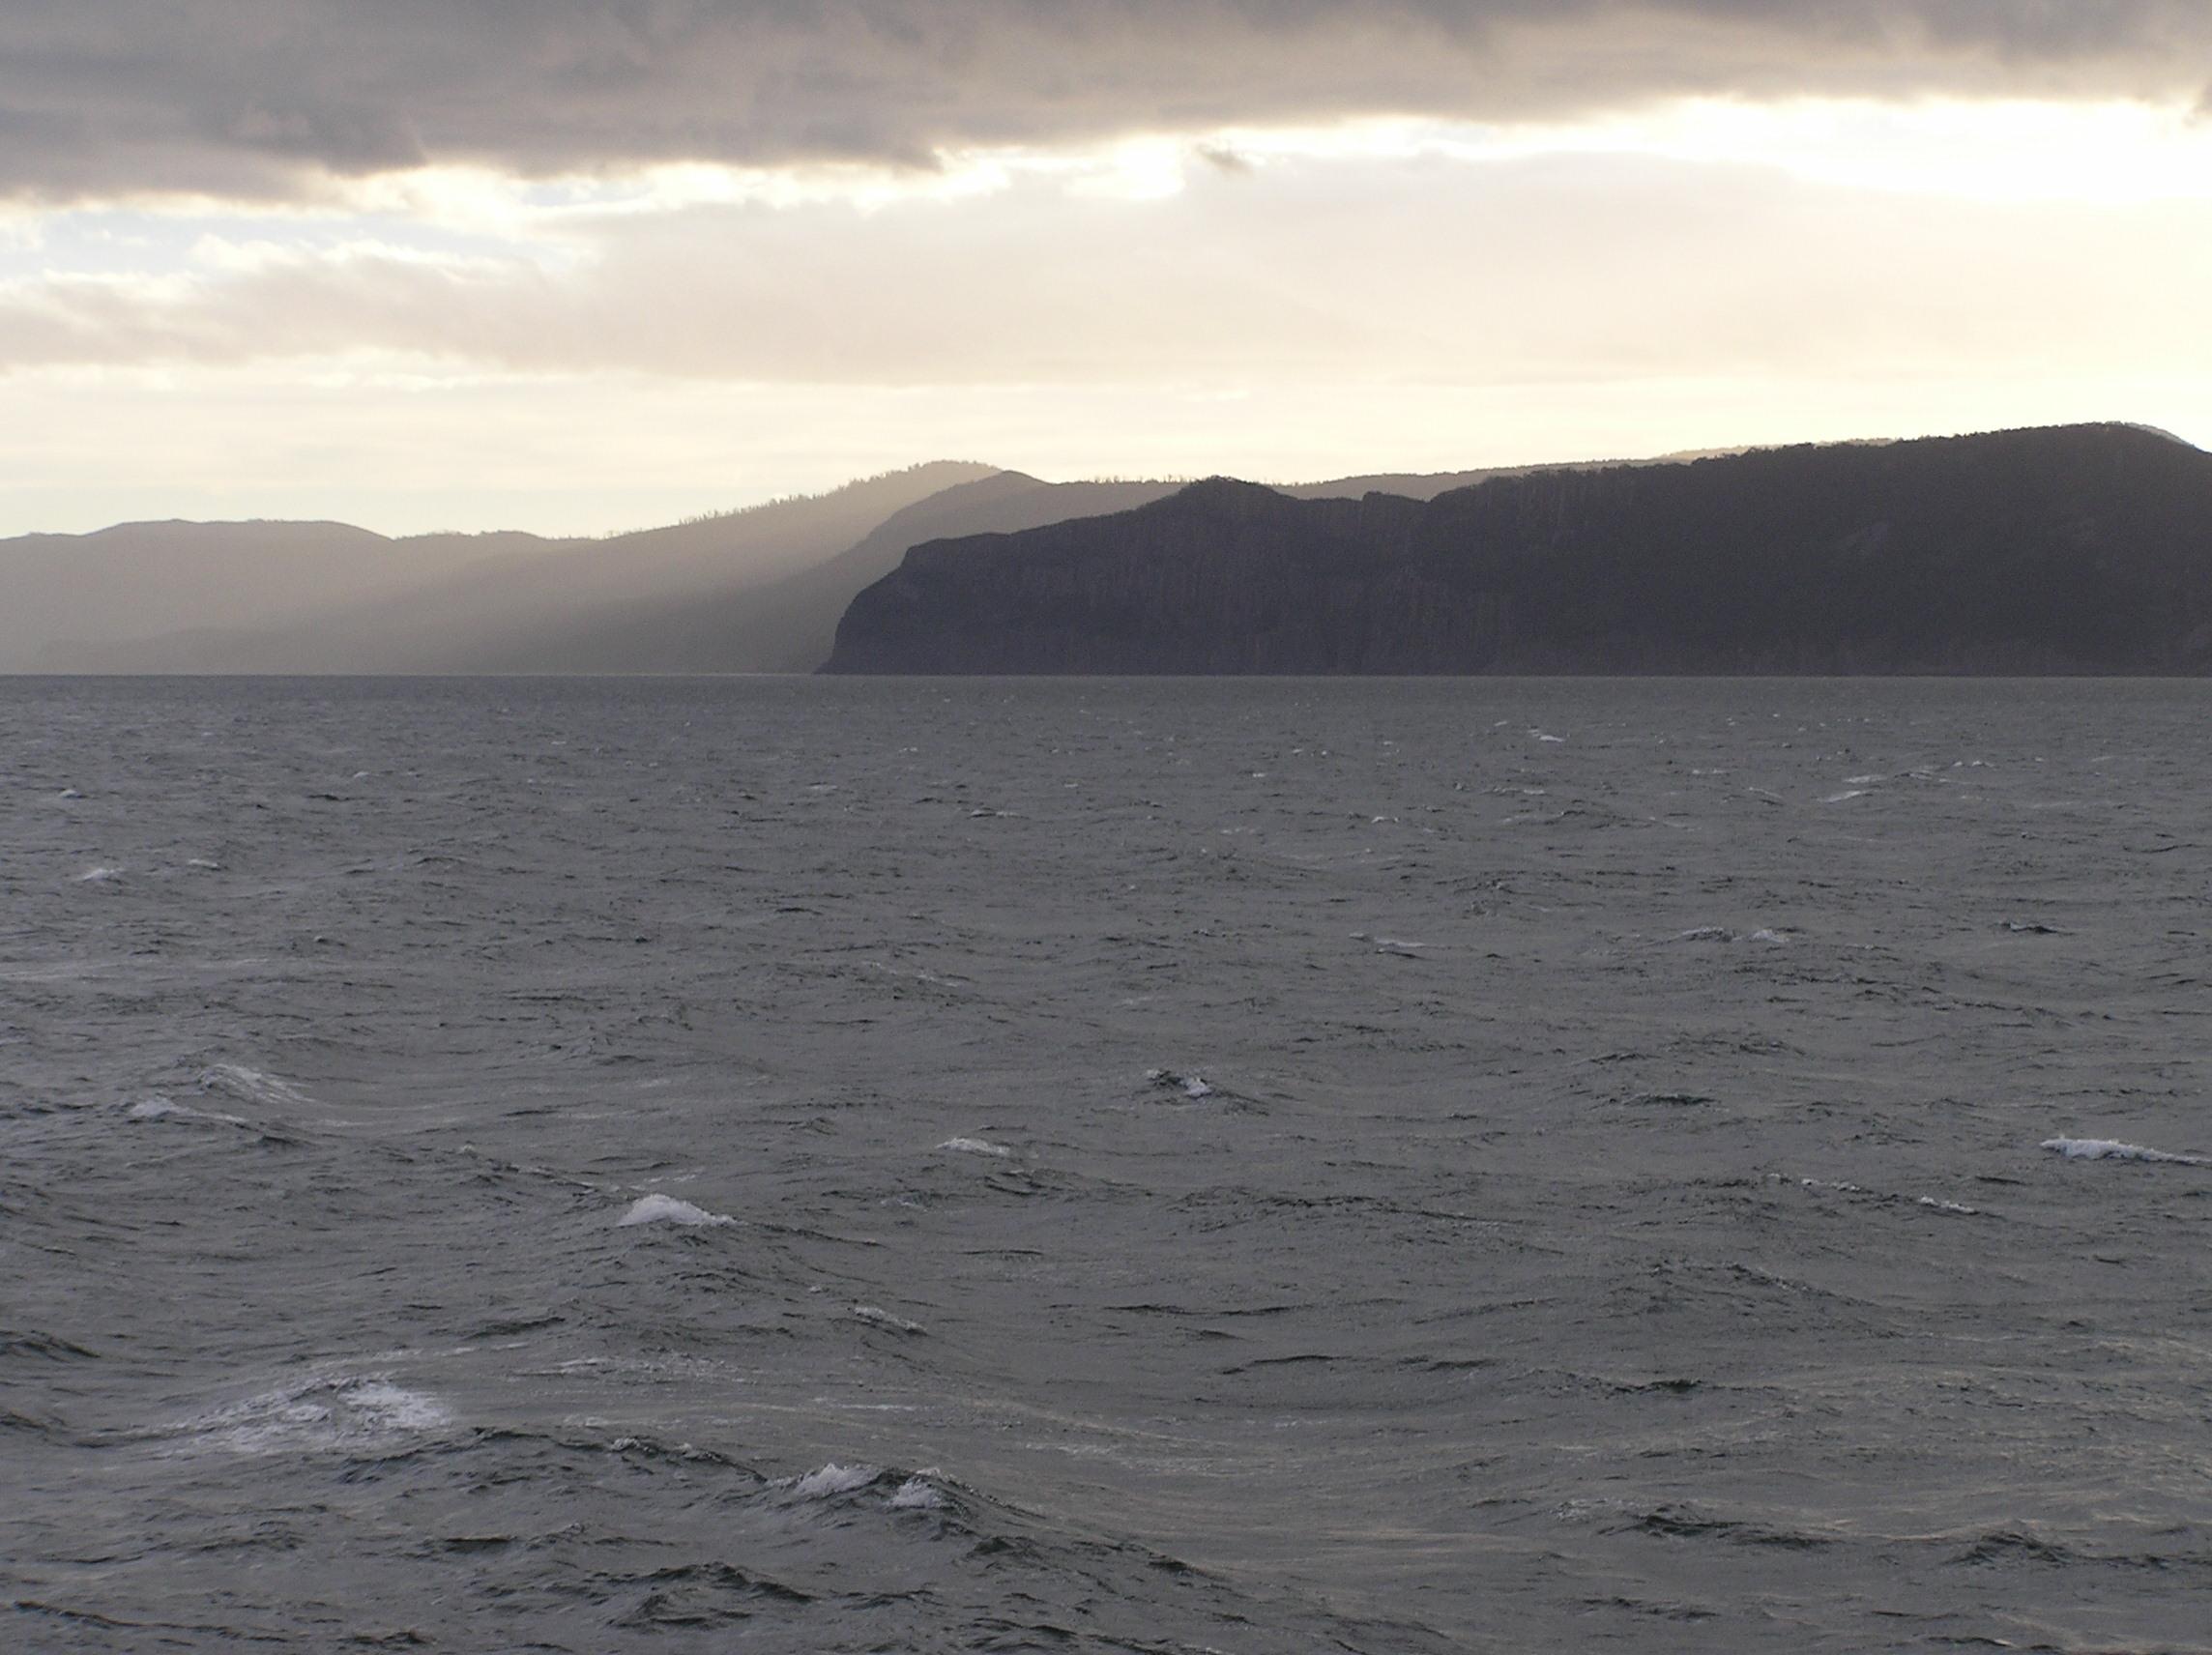 Tasmania put on an incredible show as we left Australia